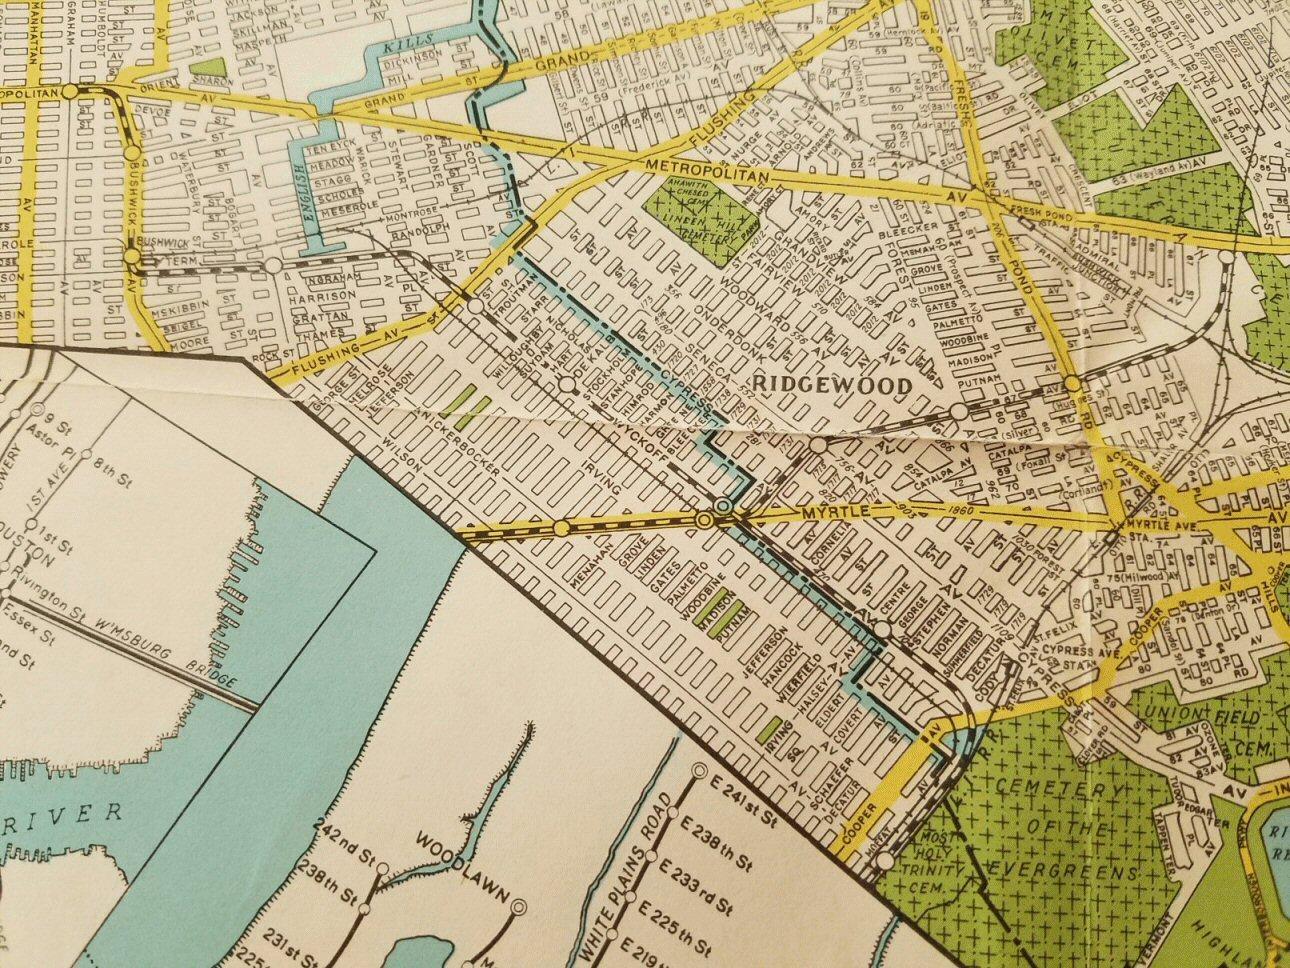 Nyc Subway Map Fron Flatbush No2 Train To Queens Jamaica Vanwick Stn.Lirr History Website Updates